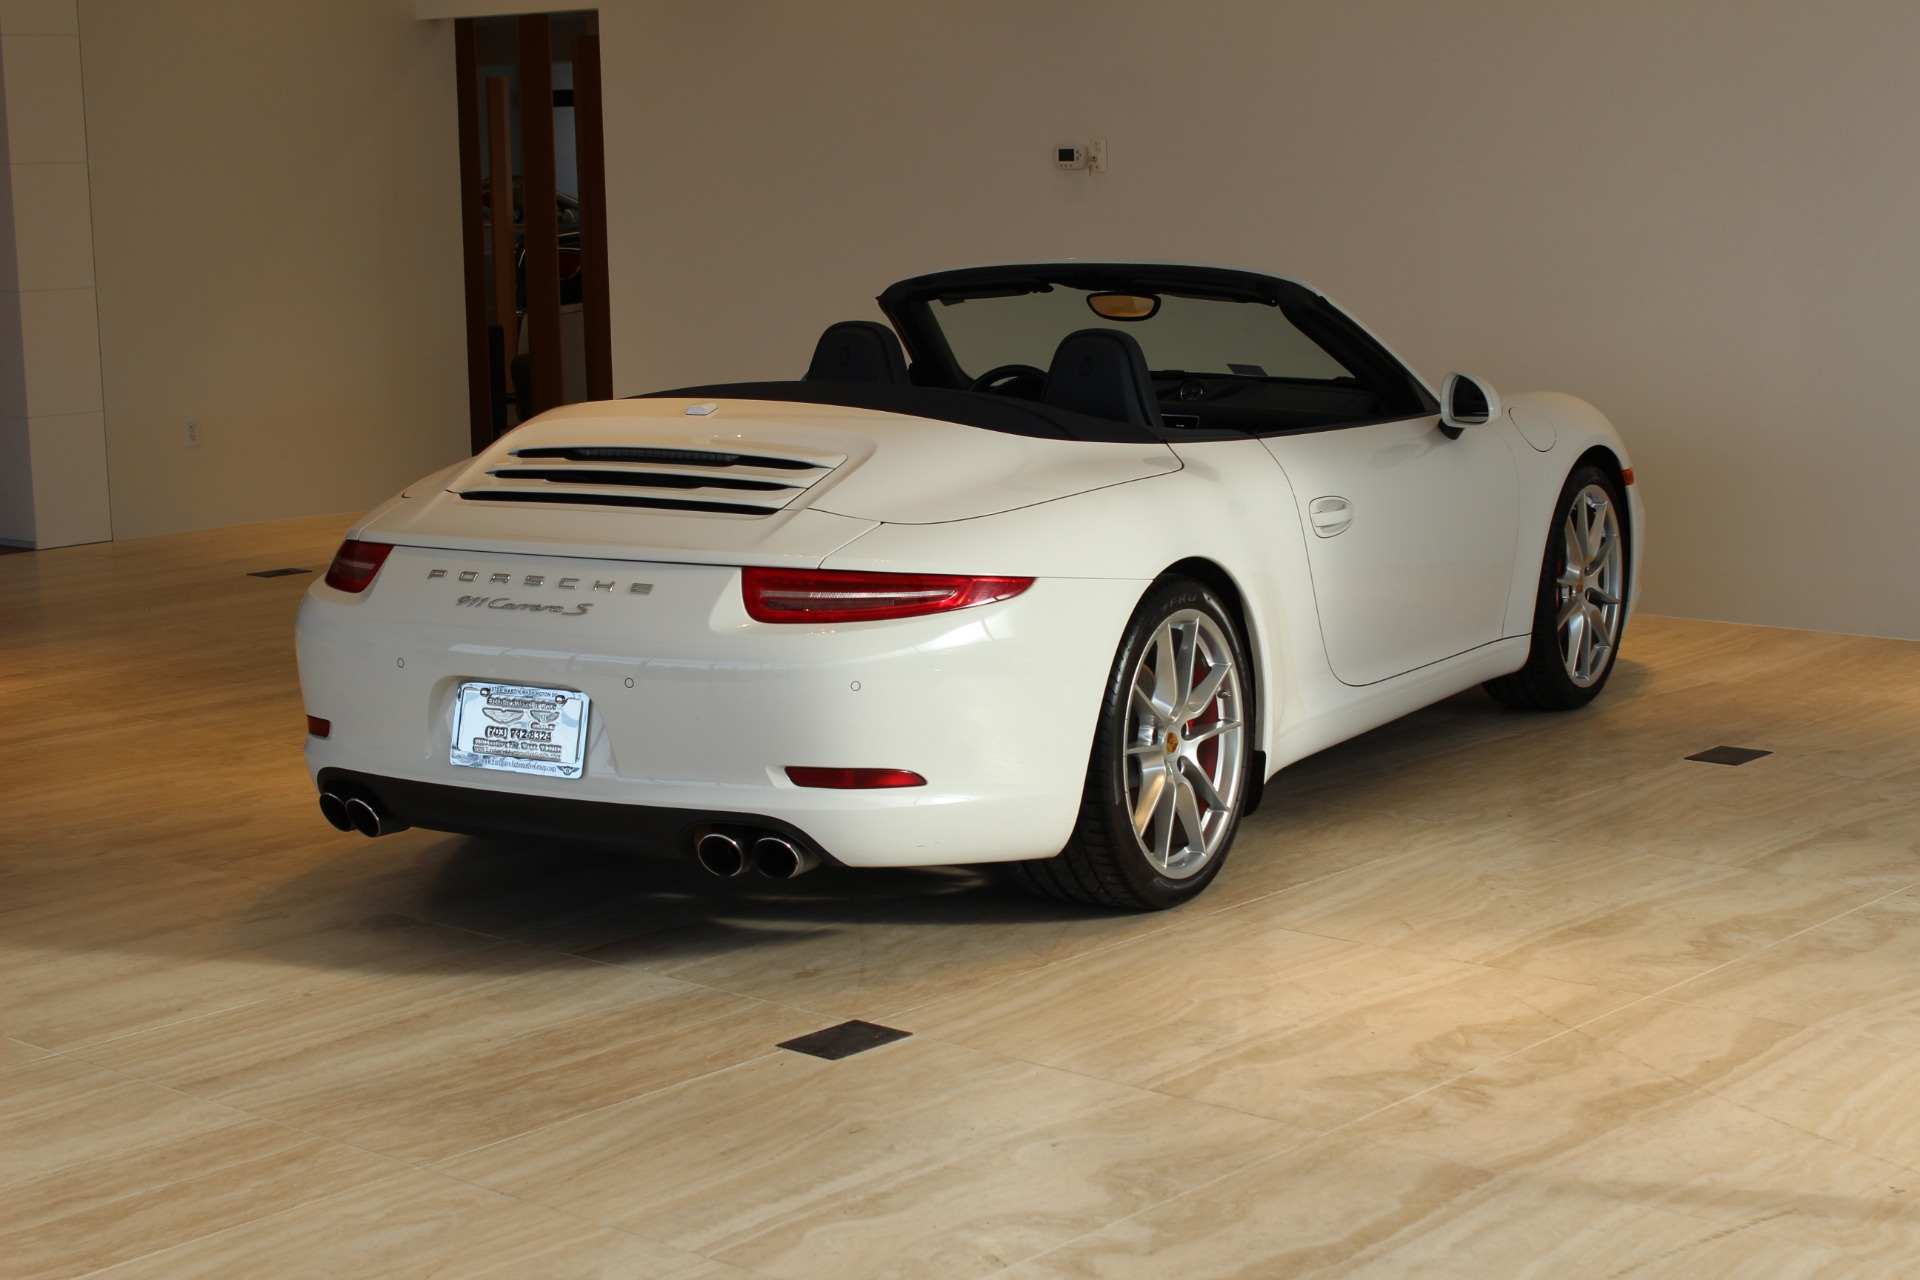 2012 porsche 911 carrera s stock p155175 for sale near vienna va va porsche dealer for sale. Black Bedroom Furniture Sets. Home Design Ideas